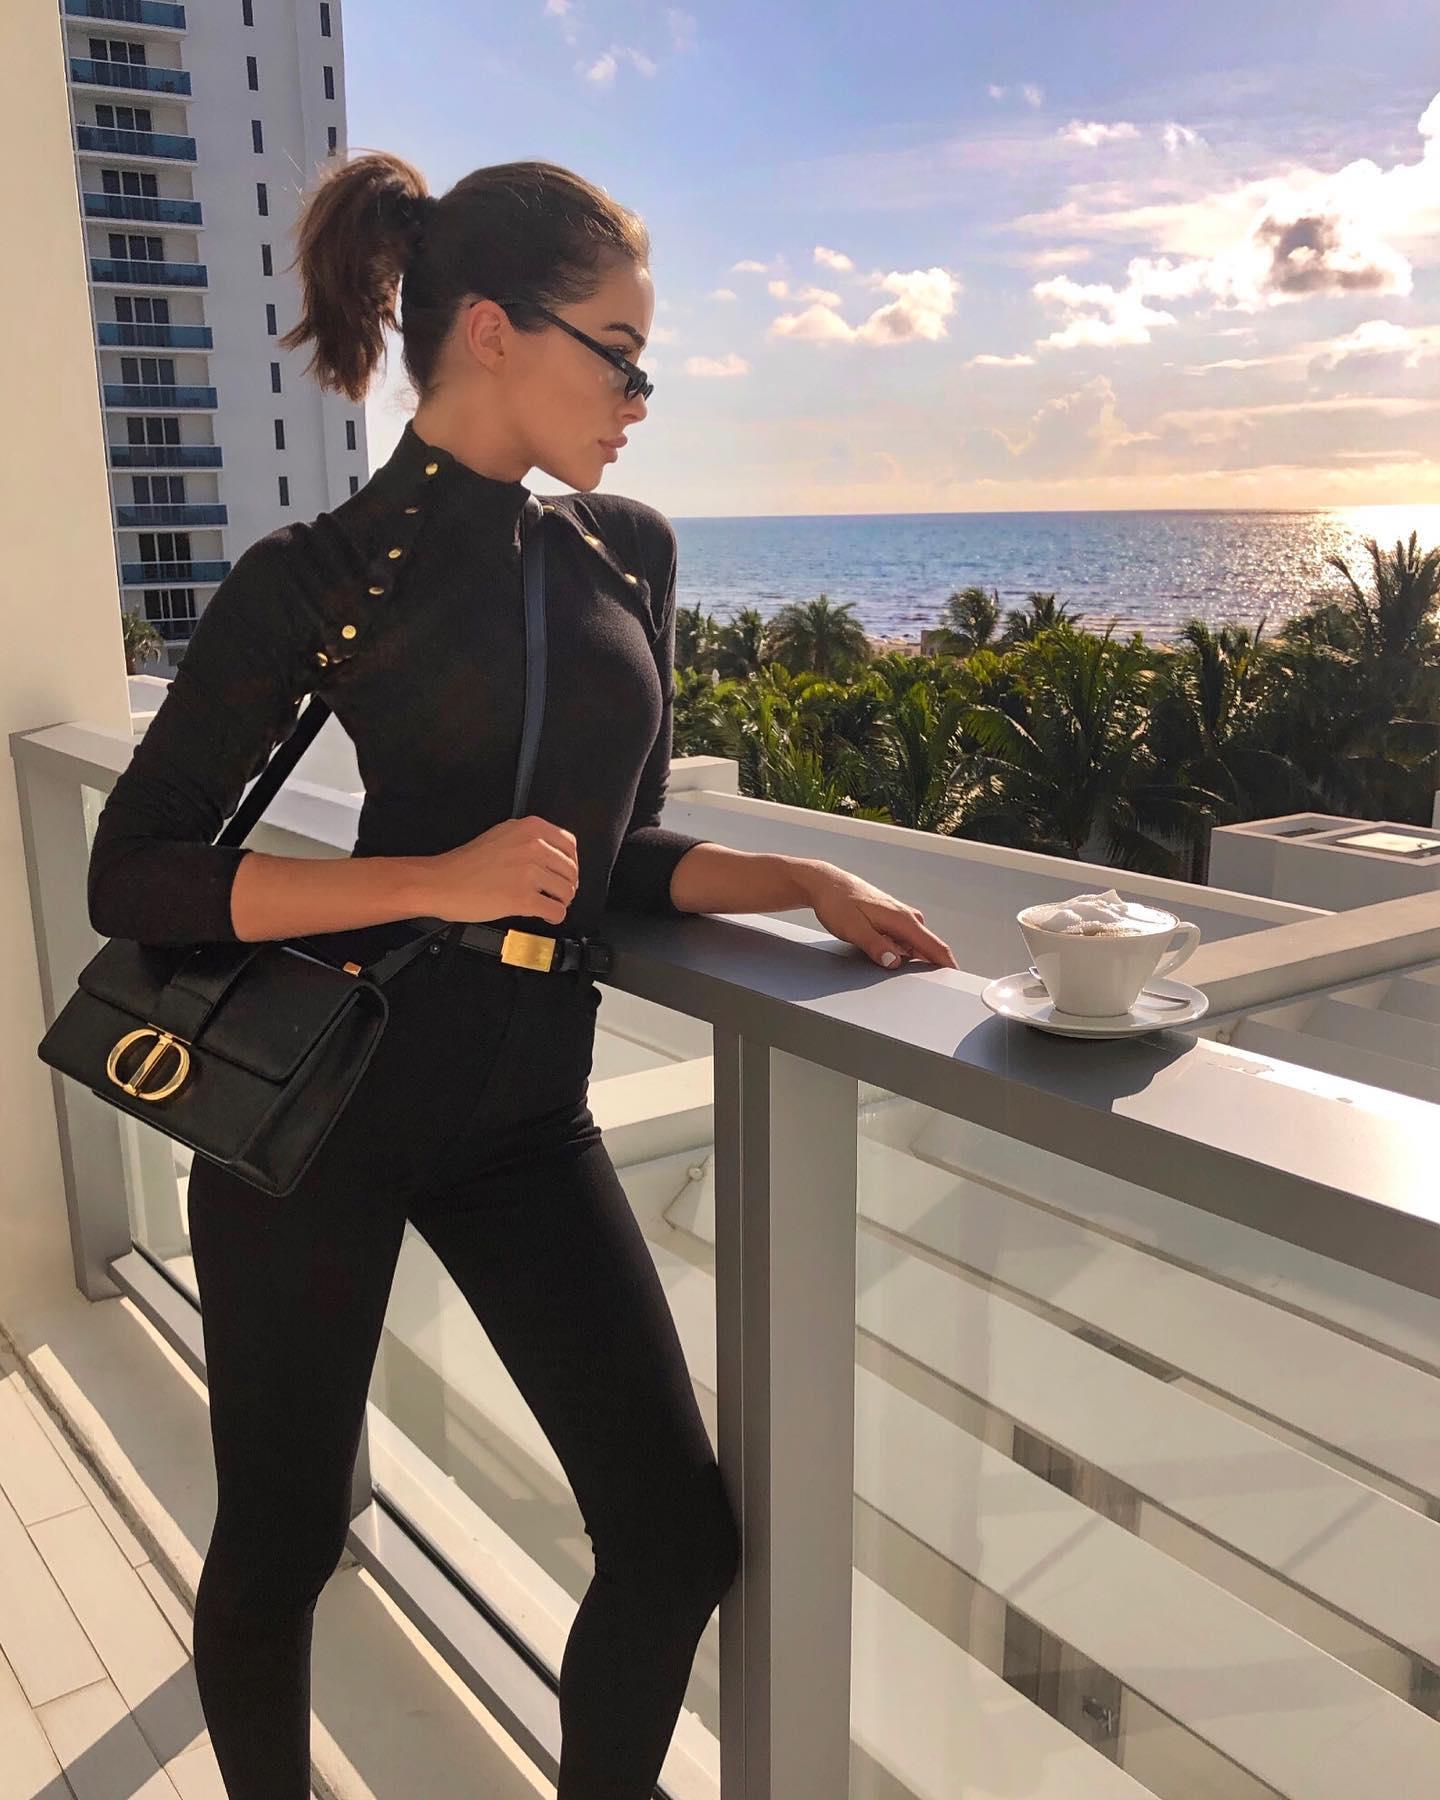 Olivia Culpo 2019 : Olivia Culpo – @oliviaculpo personal photos-31